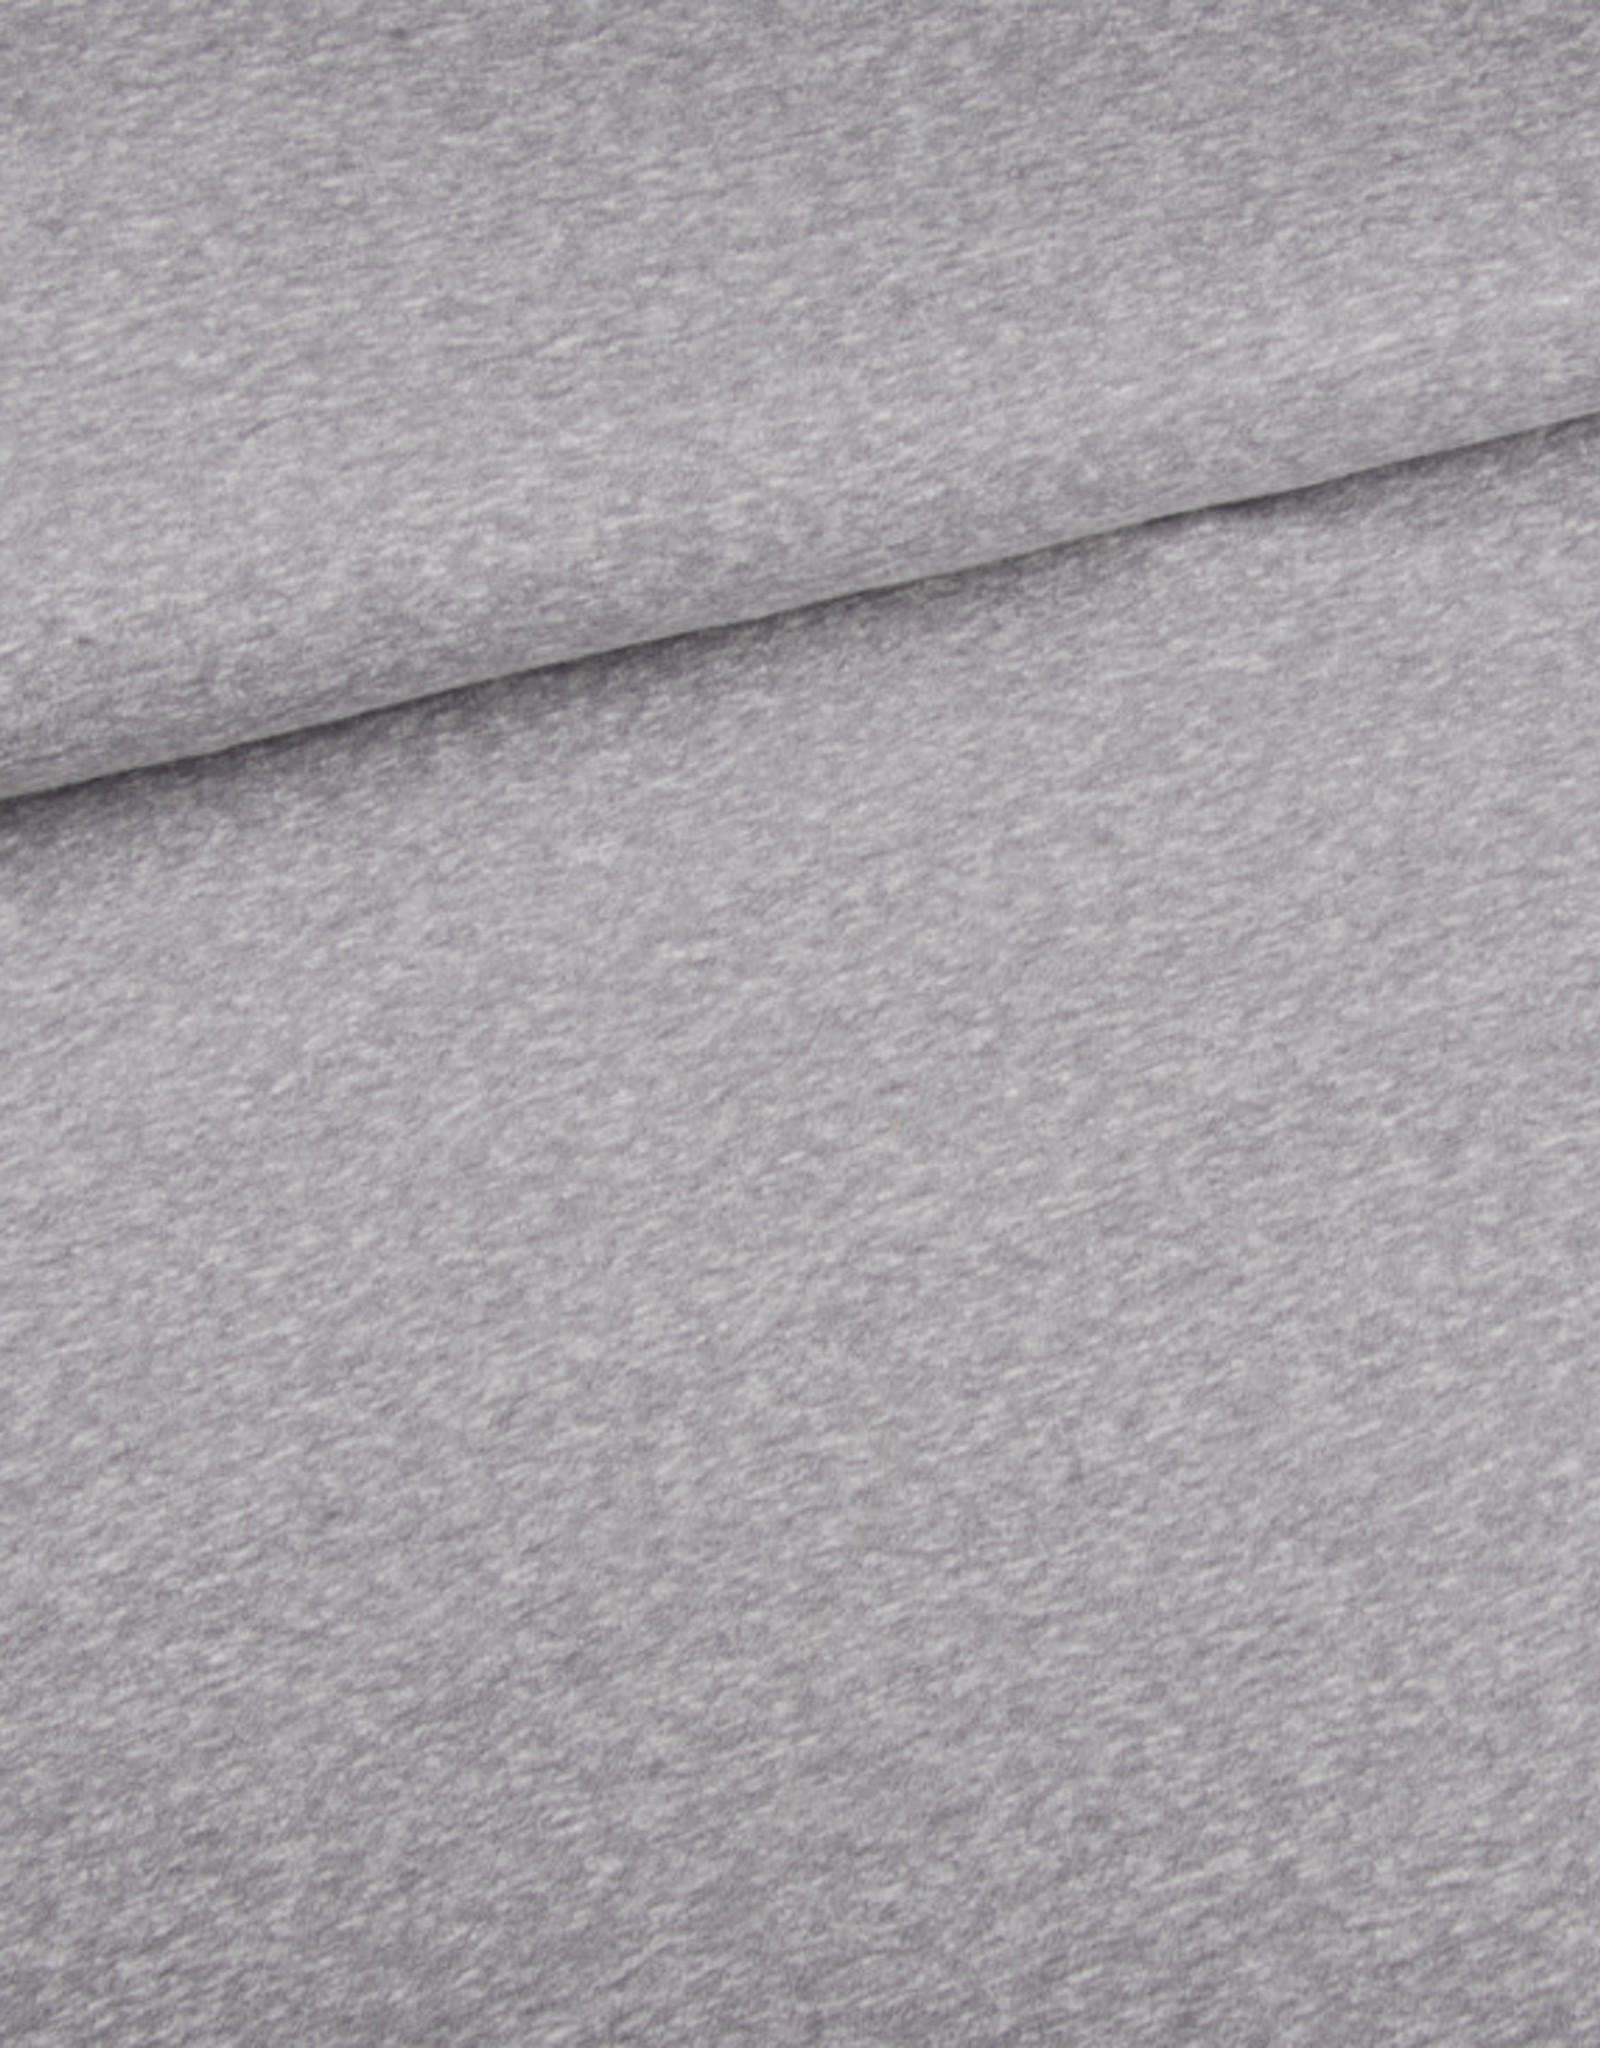 Editex Fabrics Editex Signature Jersey lichtgrijs met krijtstreepjes horizontaal